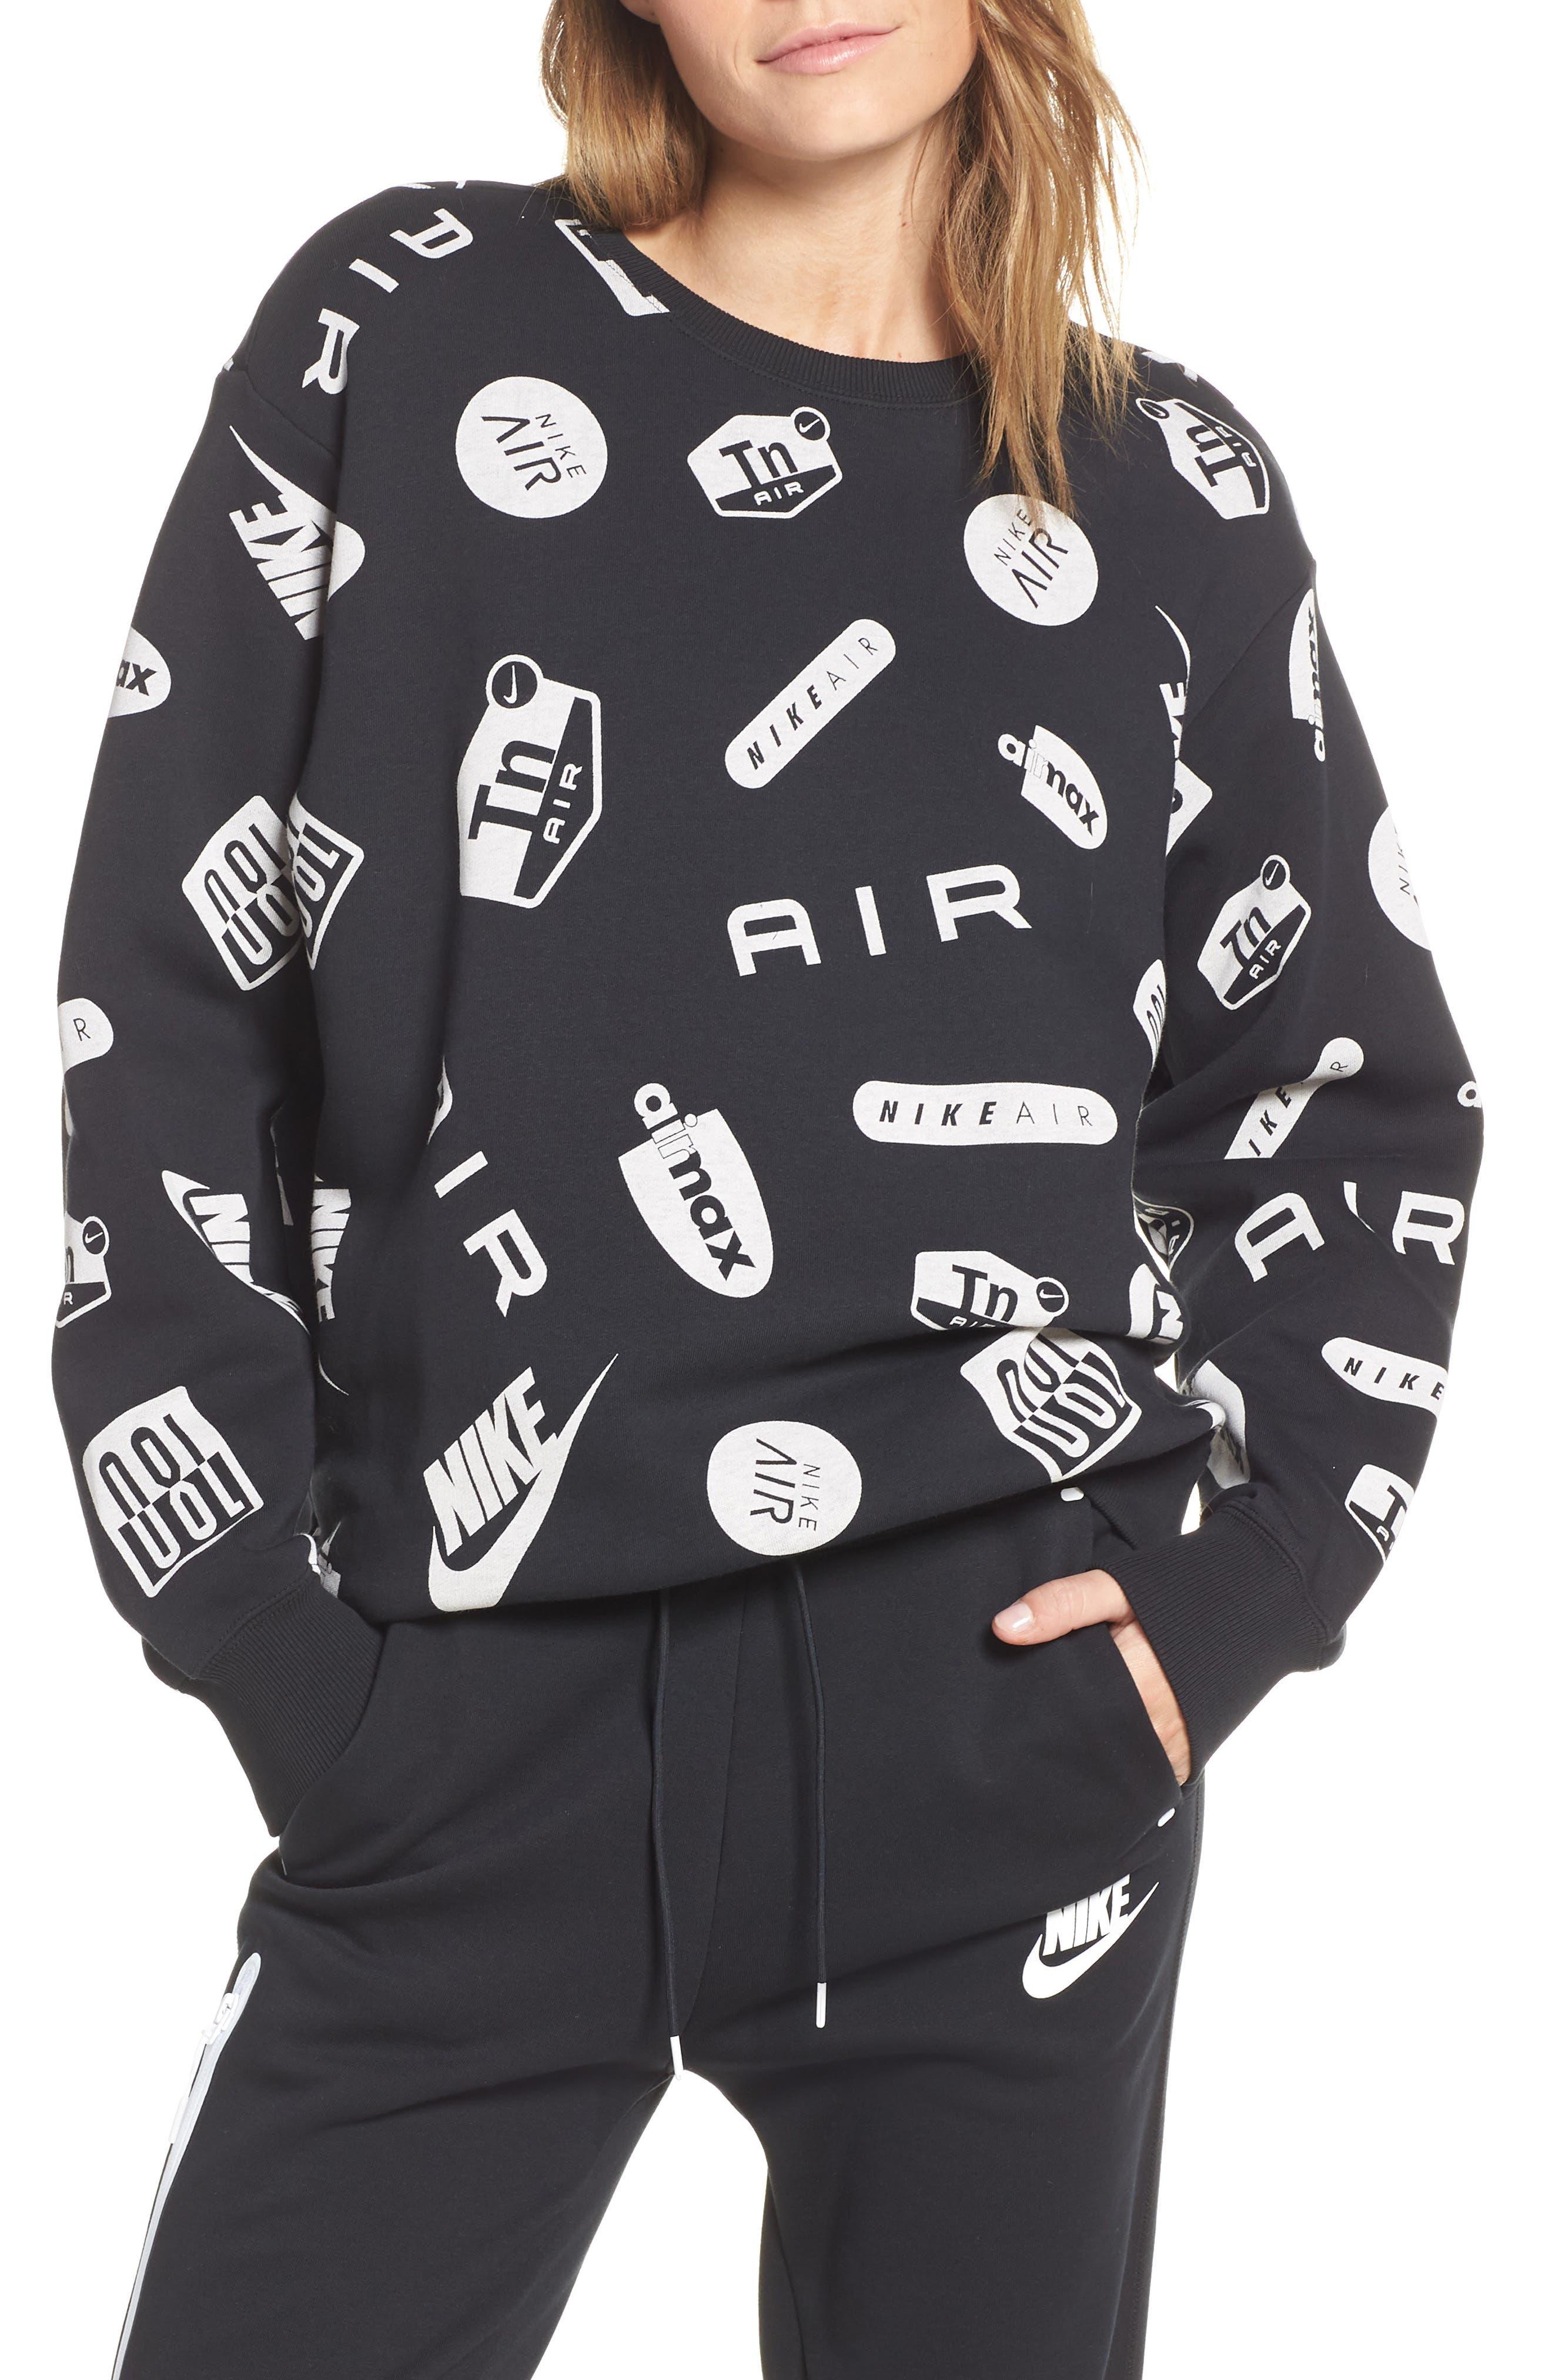 Nike Sportswear Air Max Crewneck Sweatshirt